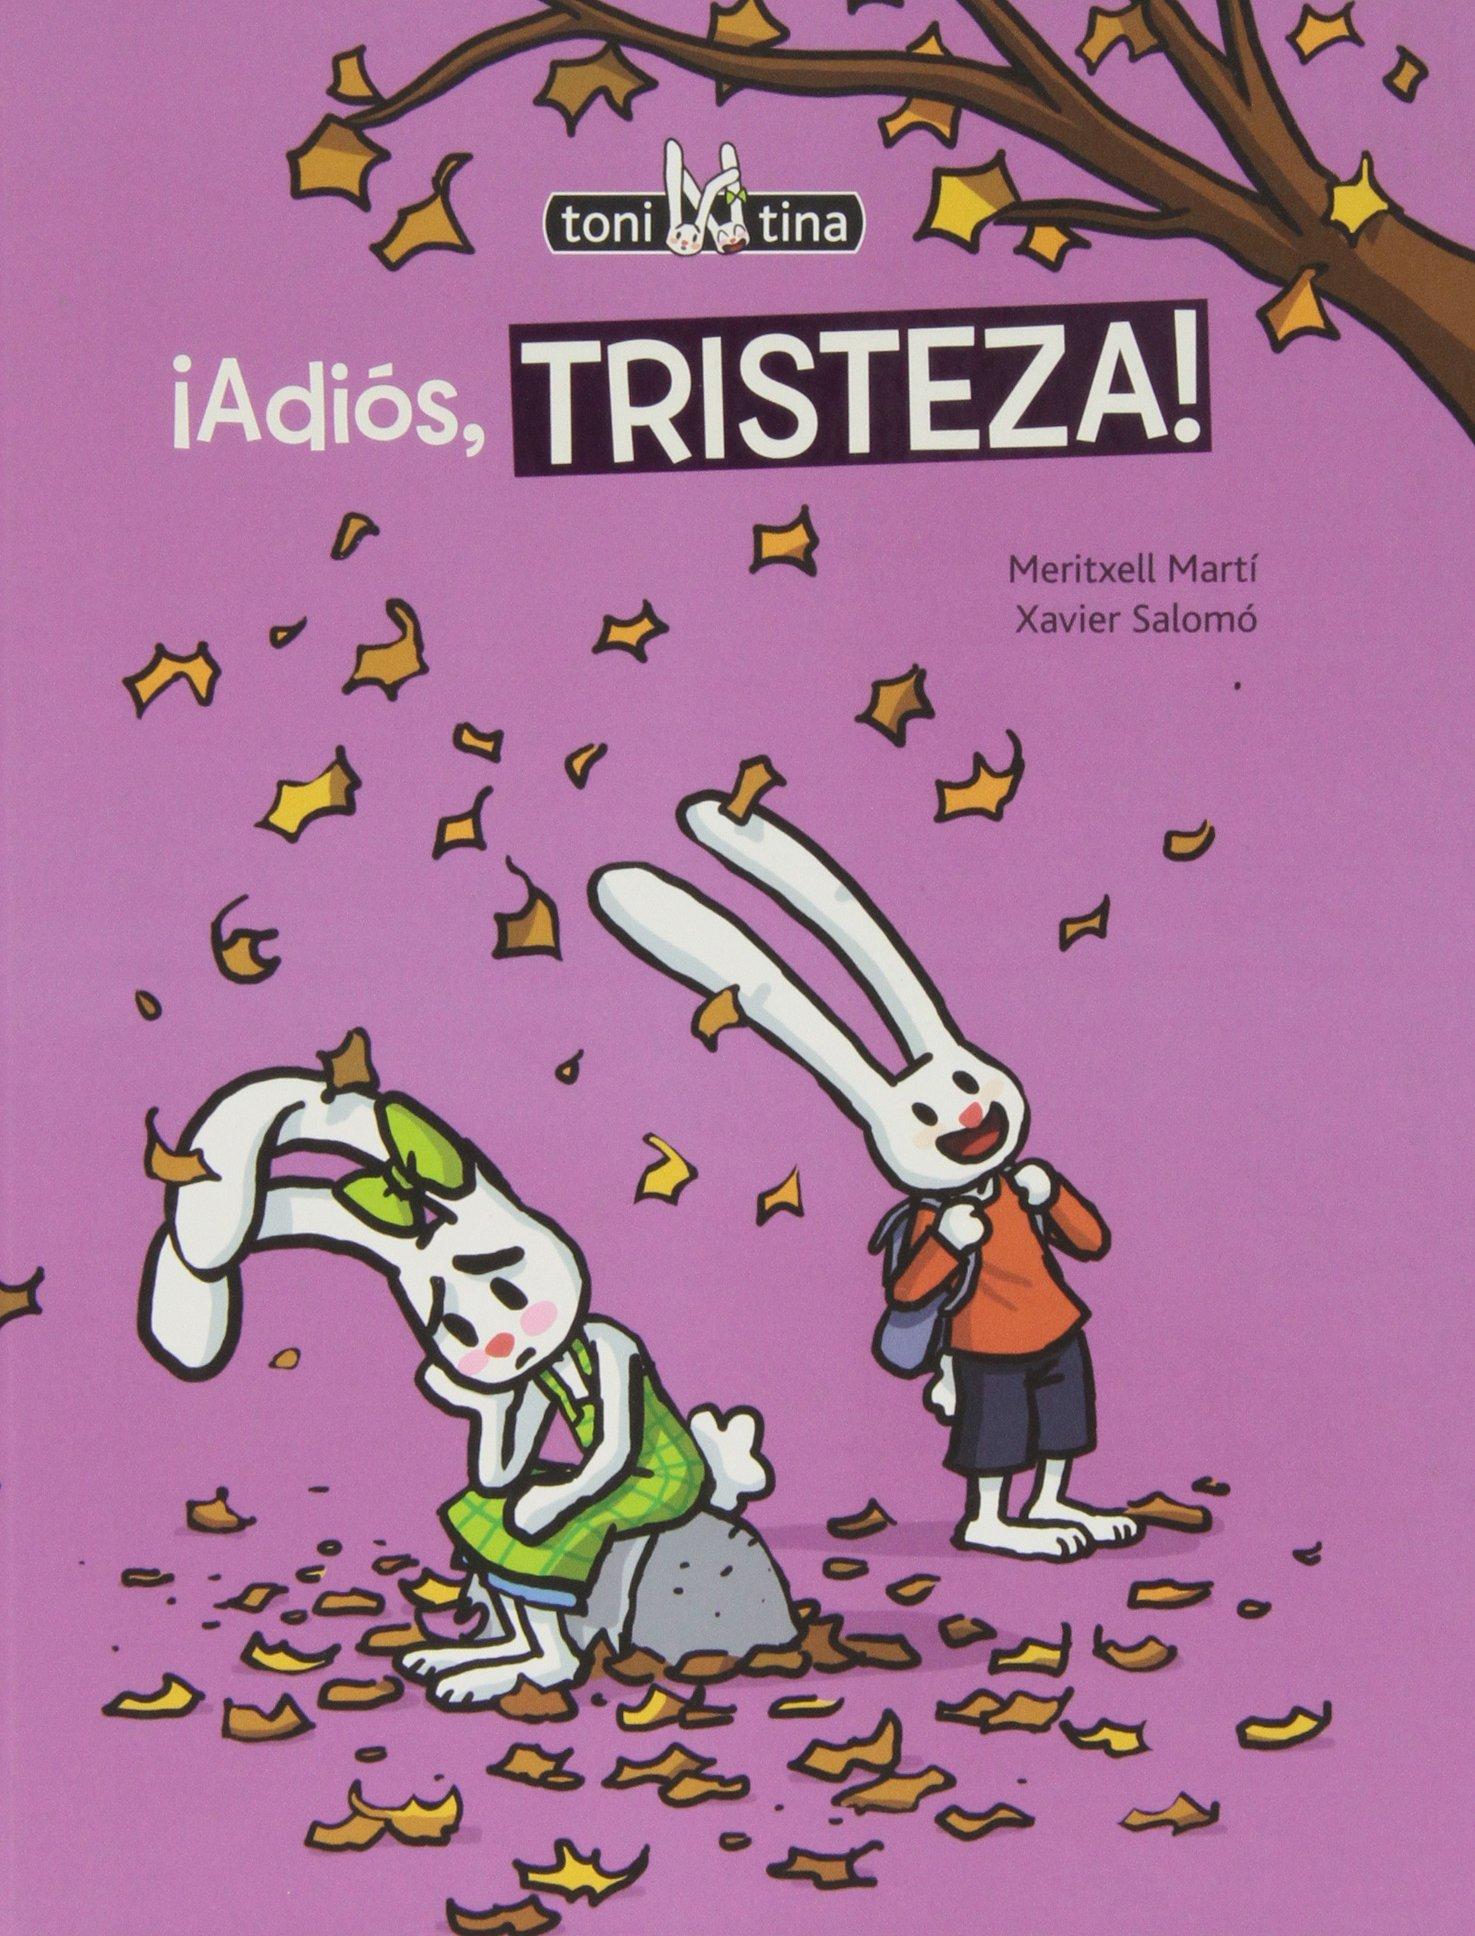 Adiós, tristeza! (Toni y Tina3): Amazon.es: Martí, Meritxell, Salomó, Xavier: Libros